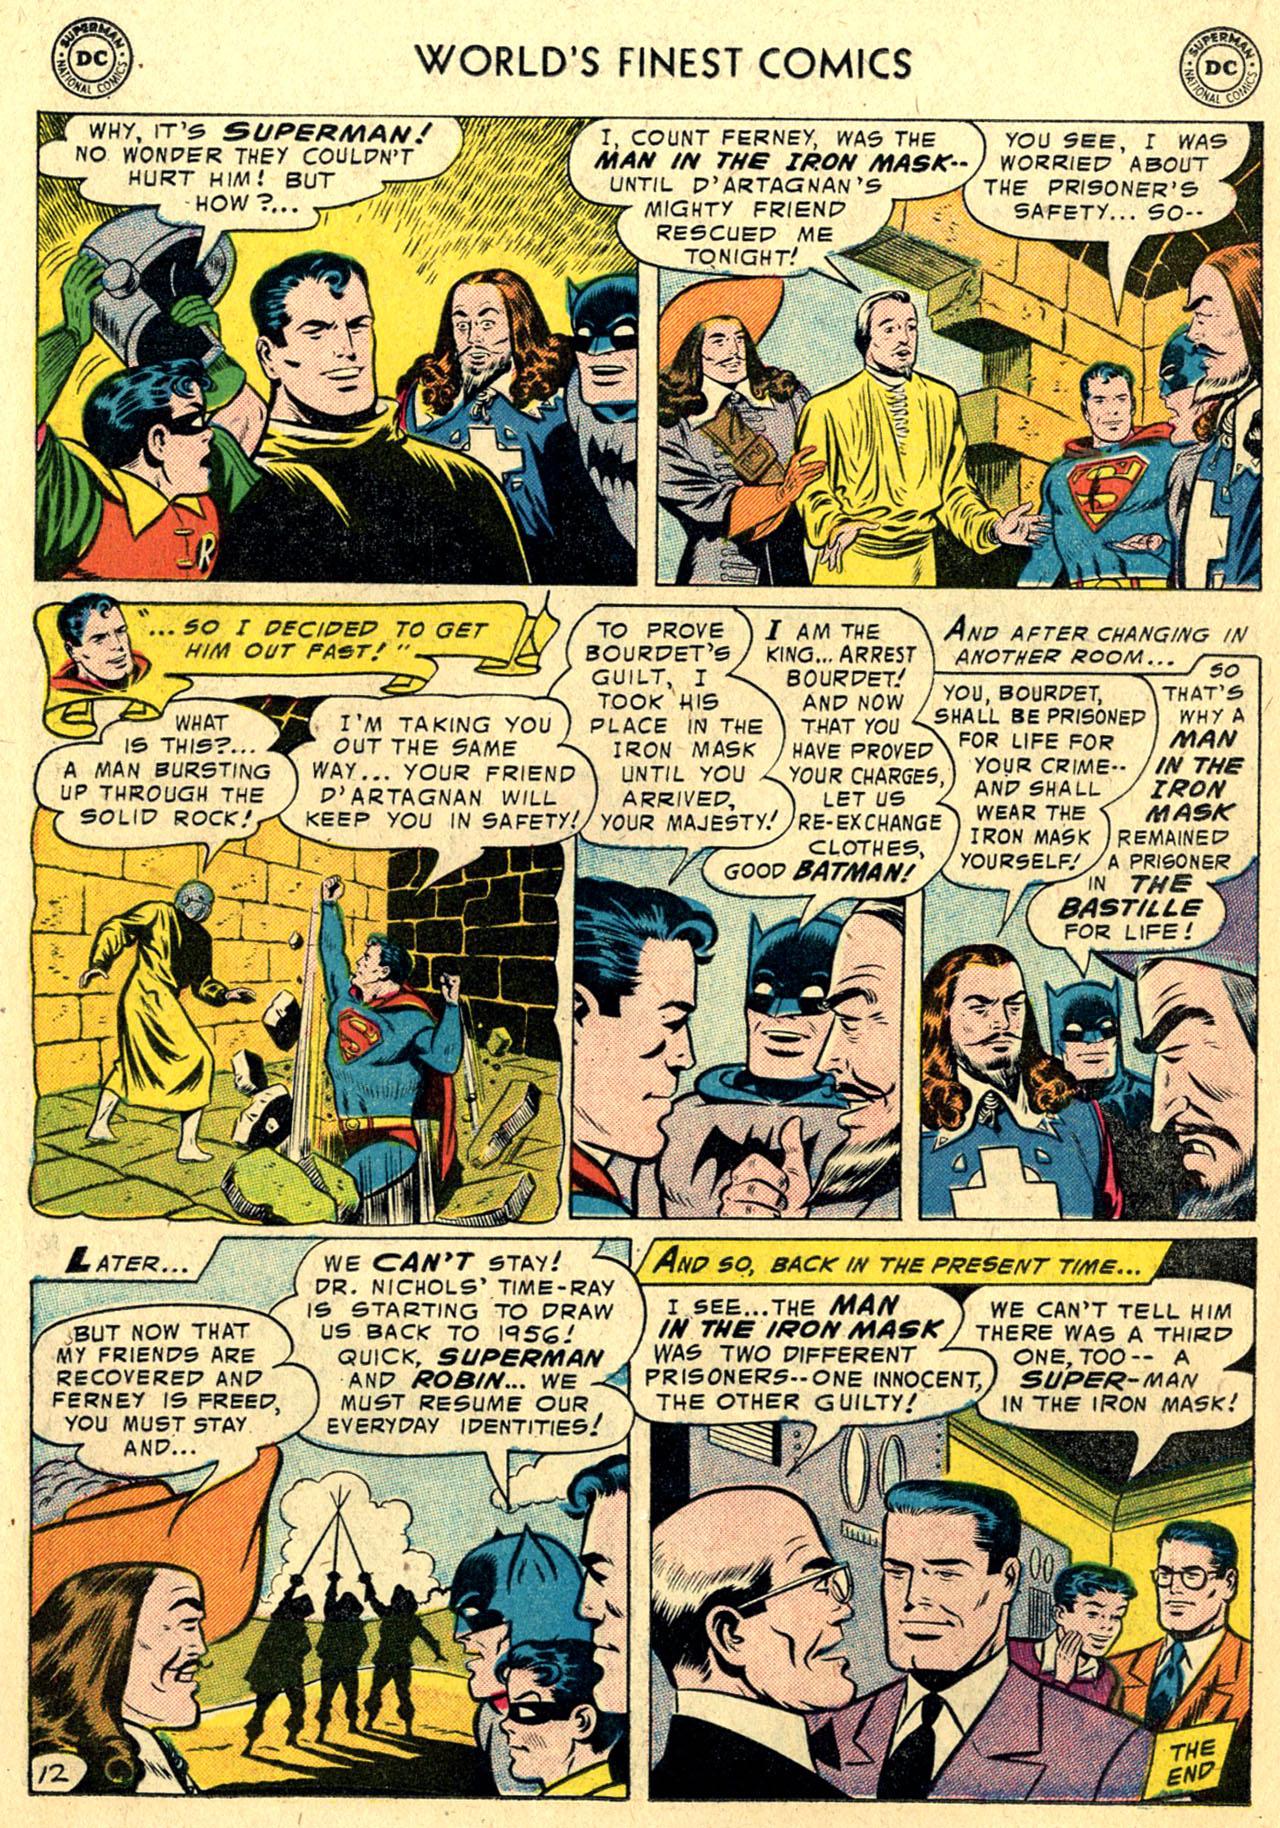 Read online World's Finest Comics comic -  Issue #82 - 14